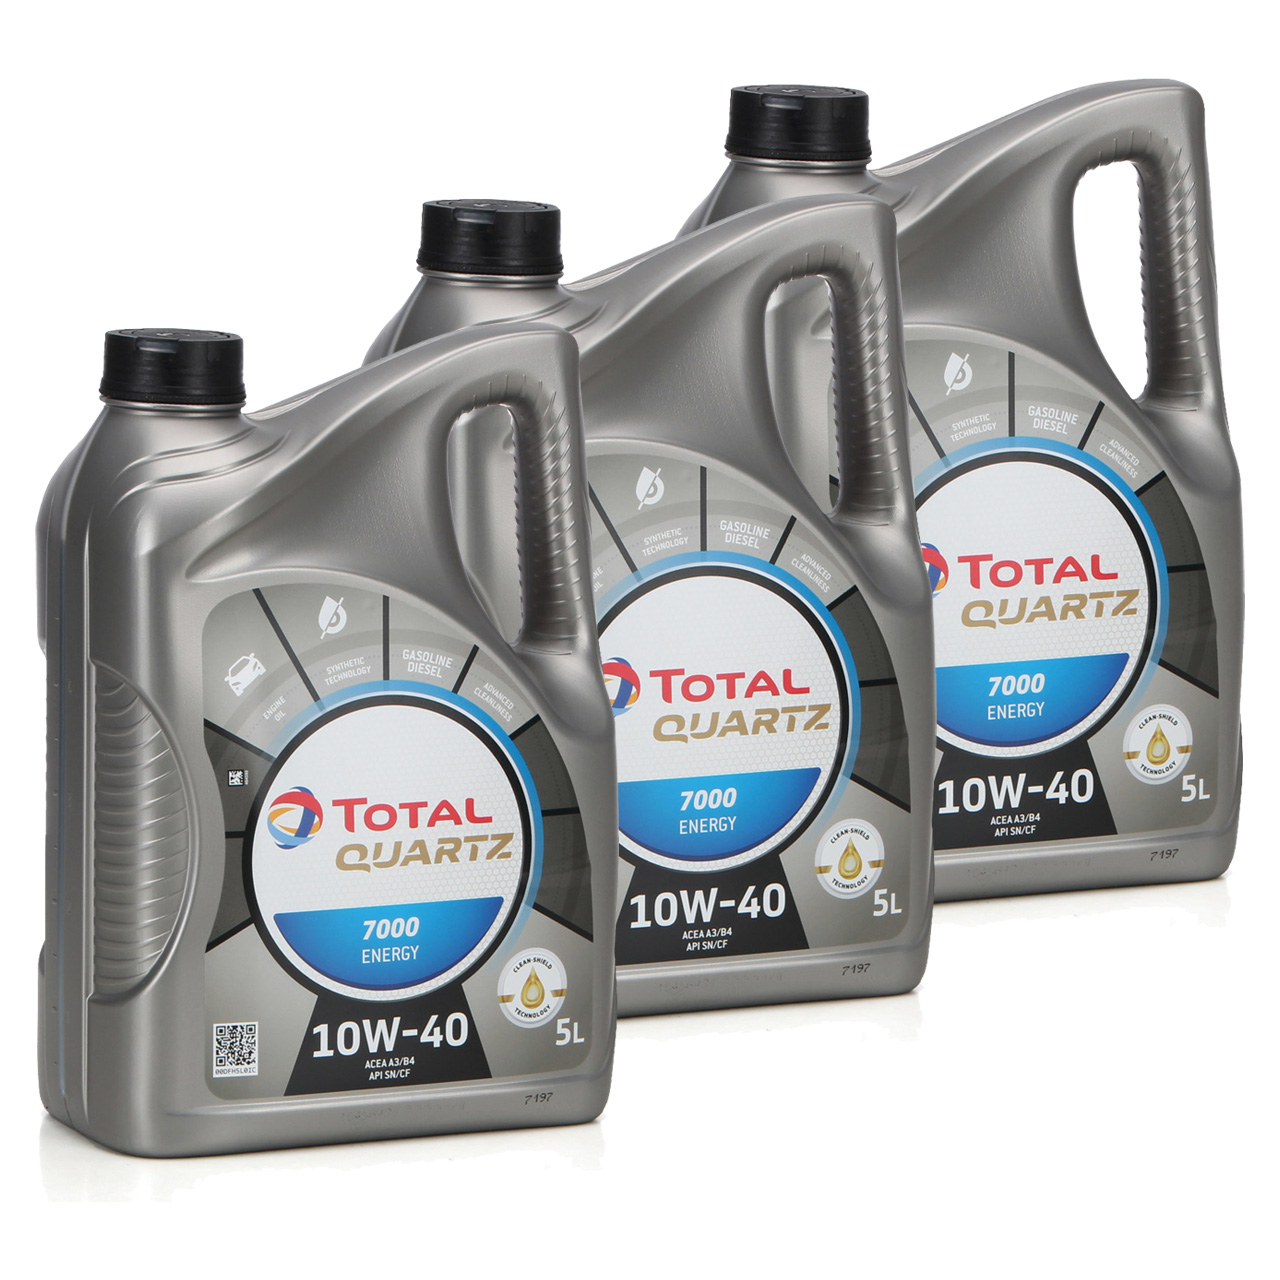 TOTAL QUARTZ 7000 ENERGY Motoröl Öl 10W-40 10W40 VW 501.01/505.00 - 15L 15 Liter